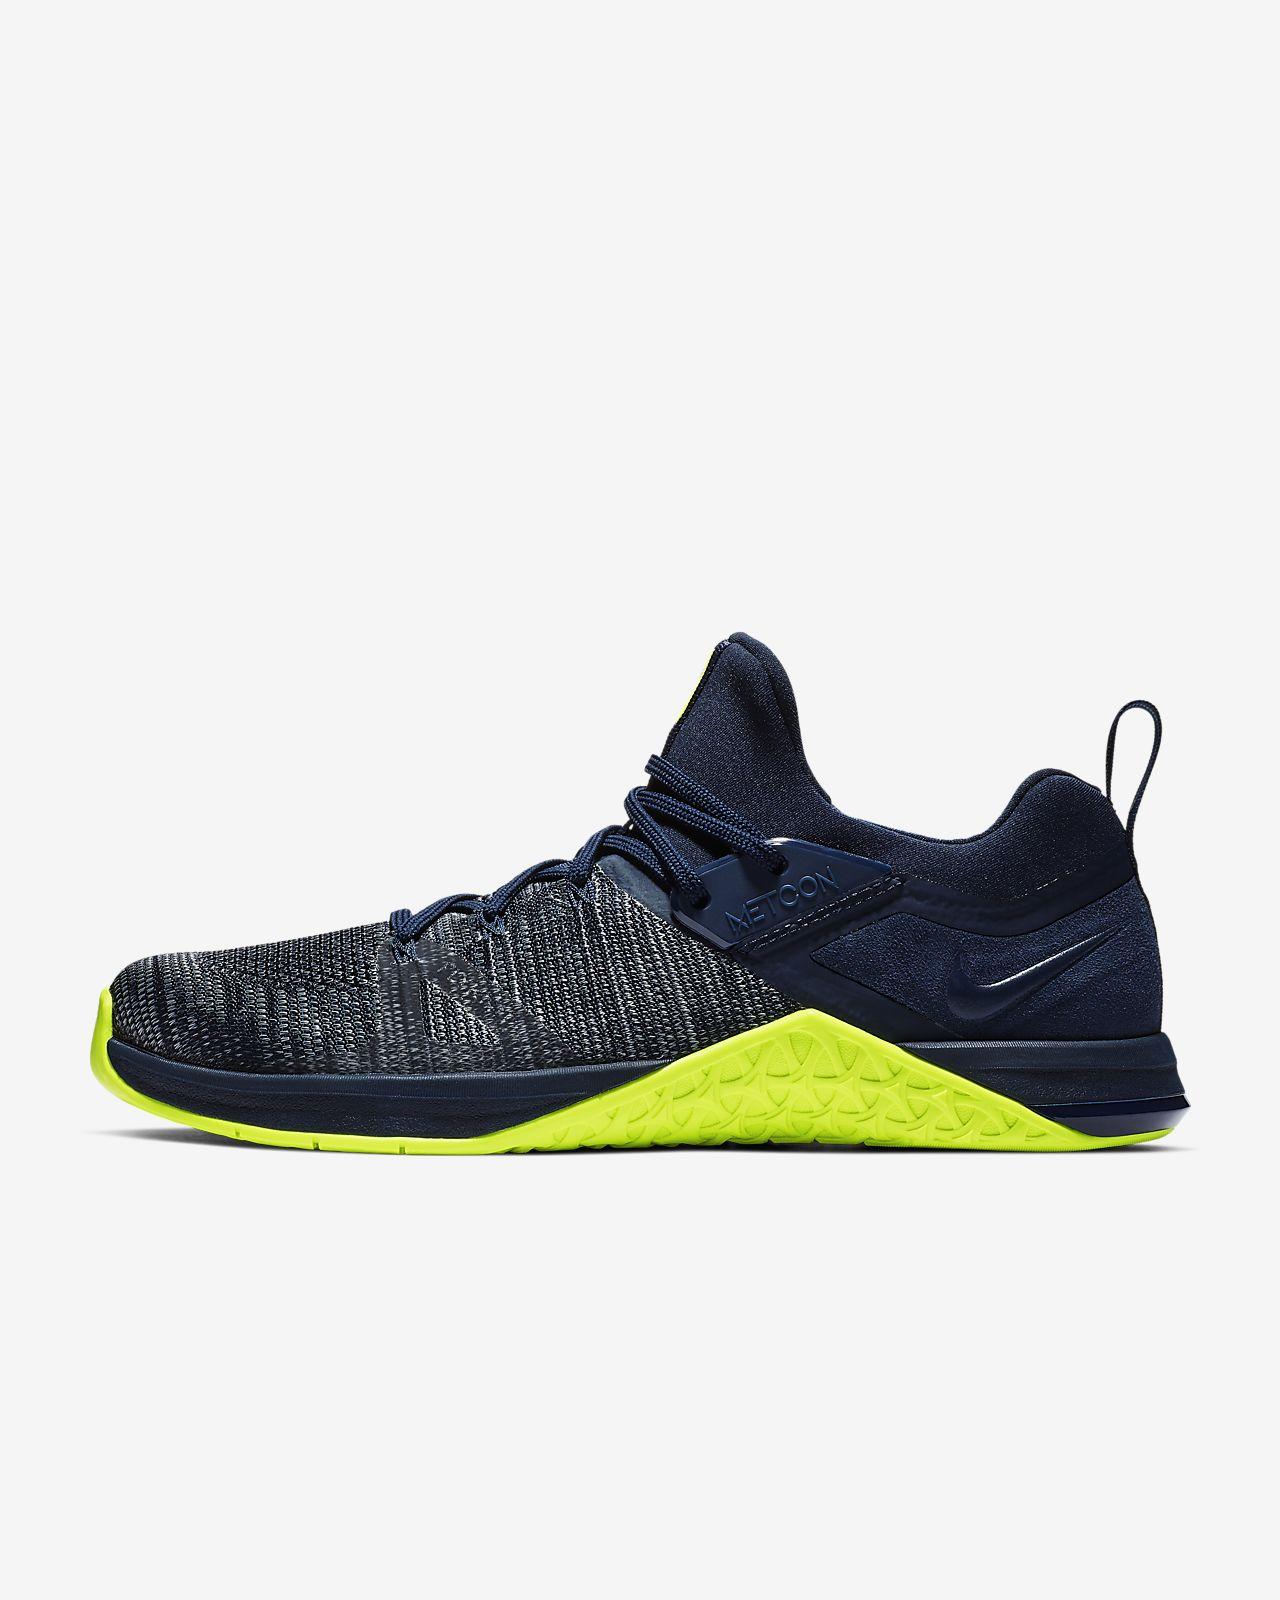 Scarpa Metcon 3 Cross Nike Trainingsollevamento Da Flyknit Pesi IfyYgmb76v